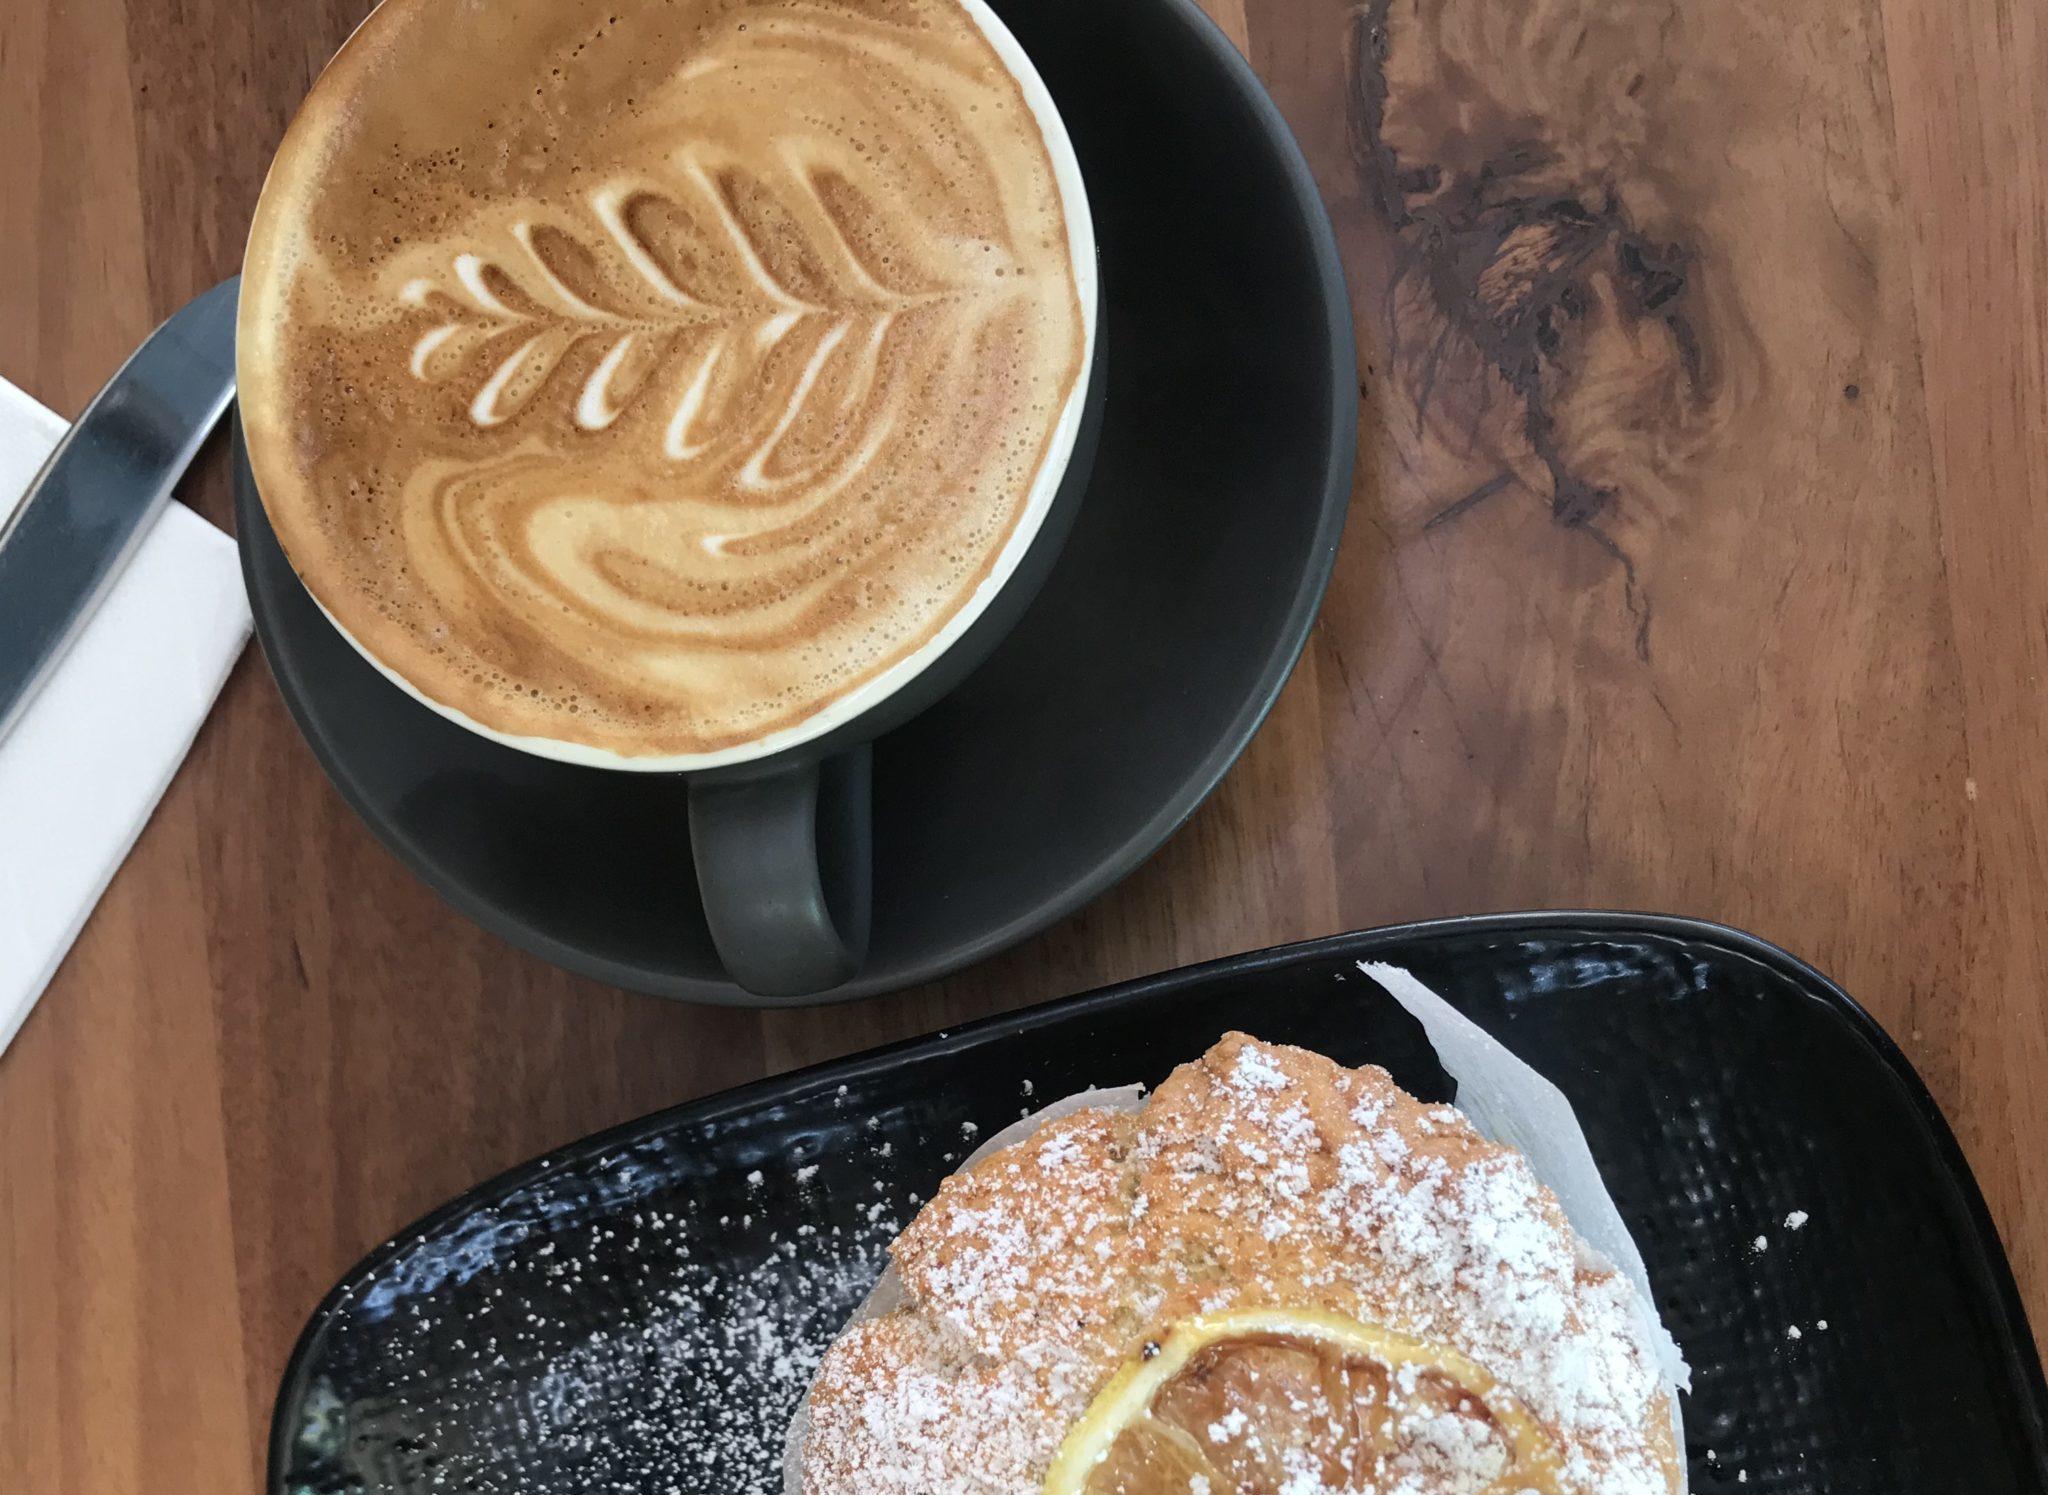 Silvios Italiano Cafe, coffee